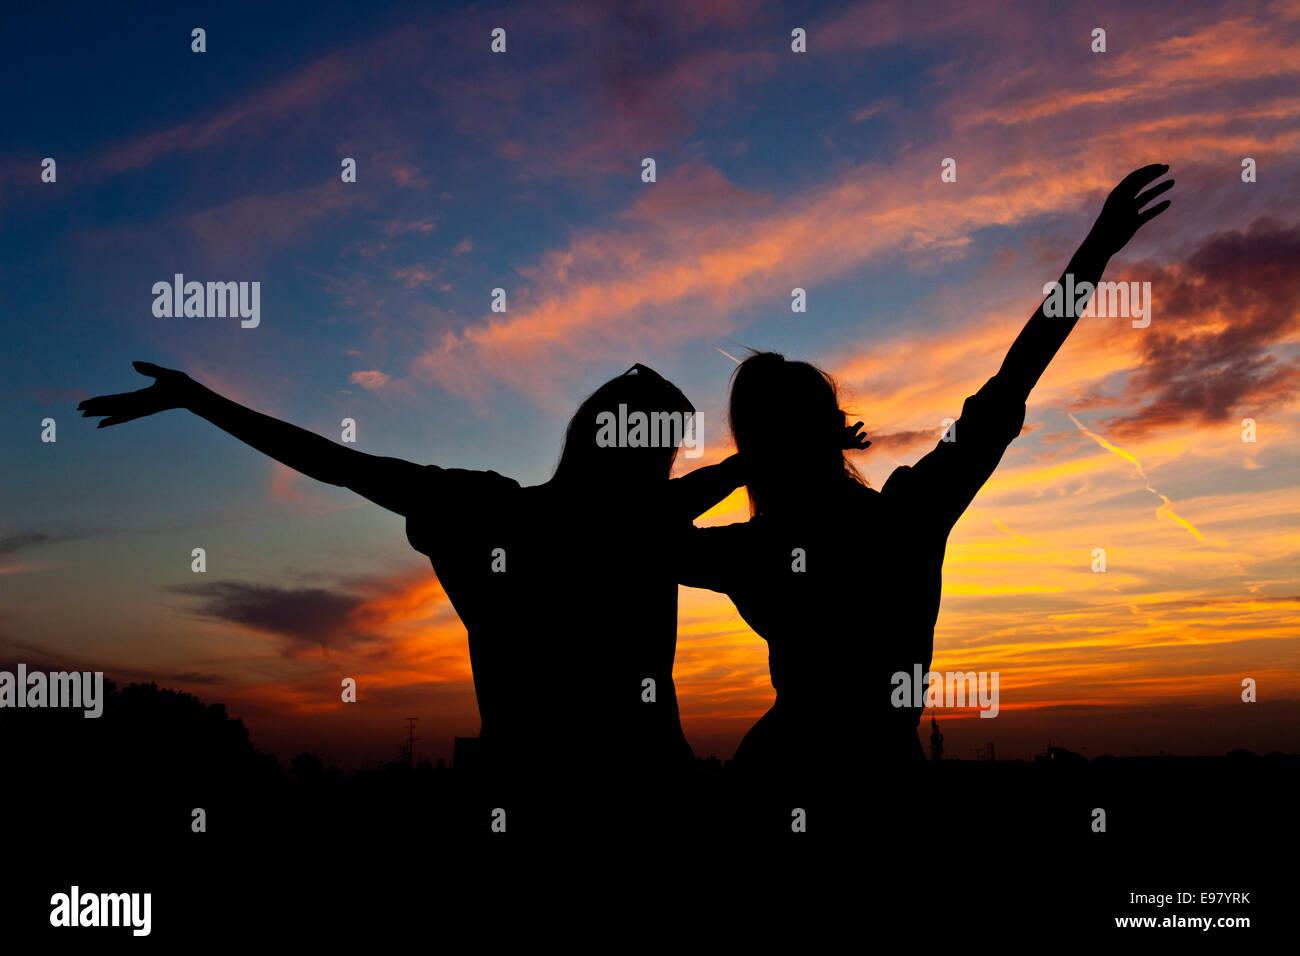 Junge Frauen mit erhobenen Armen tanzen bei Sonnenuntergang Stockbild